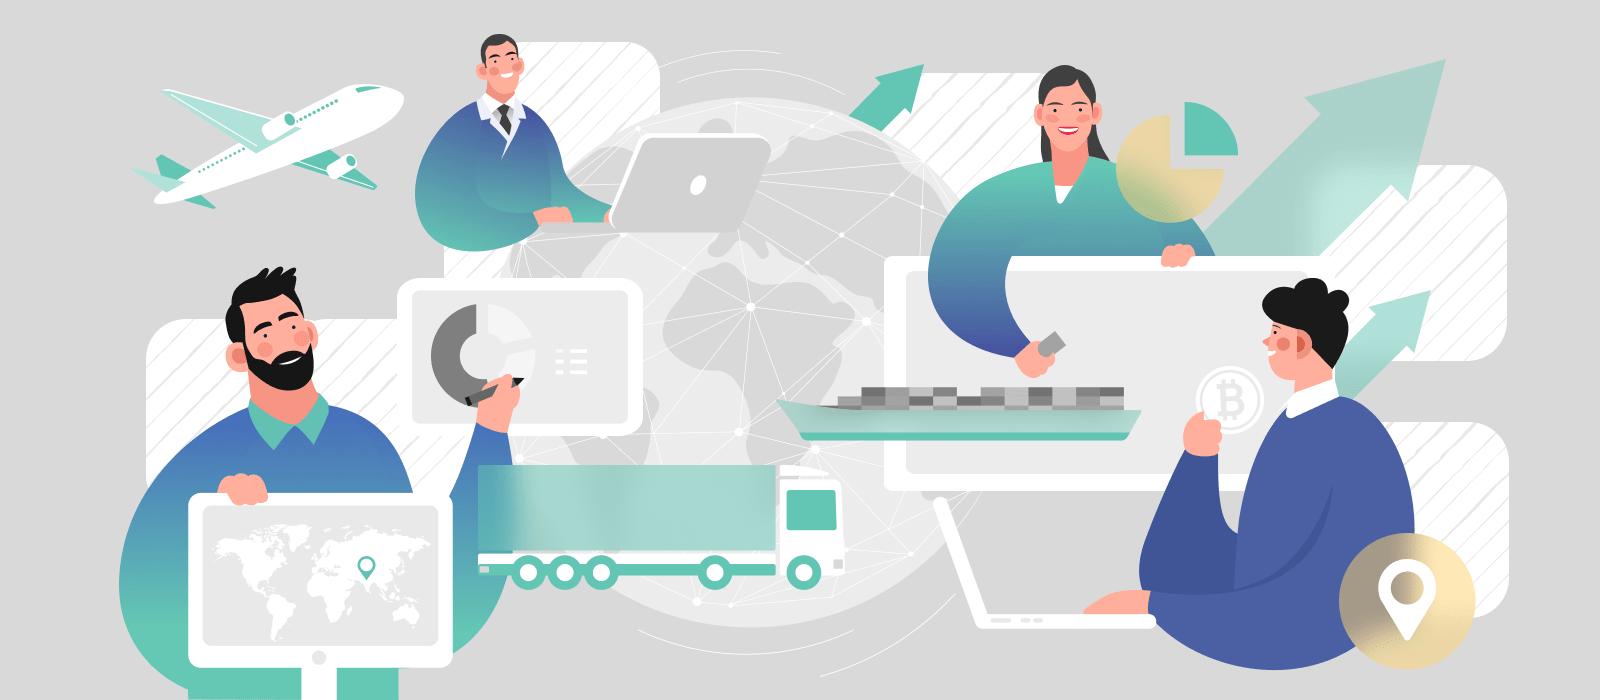 People optimizing supply chain management using blockchain technology